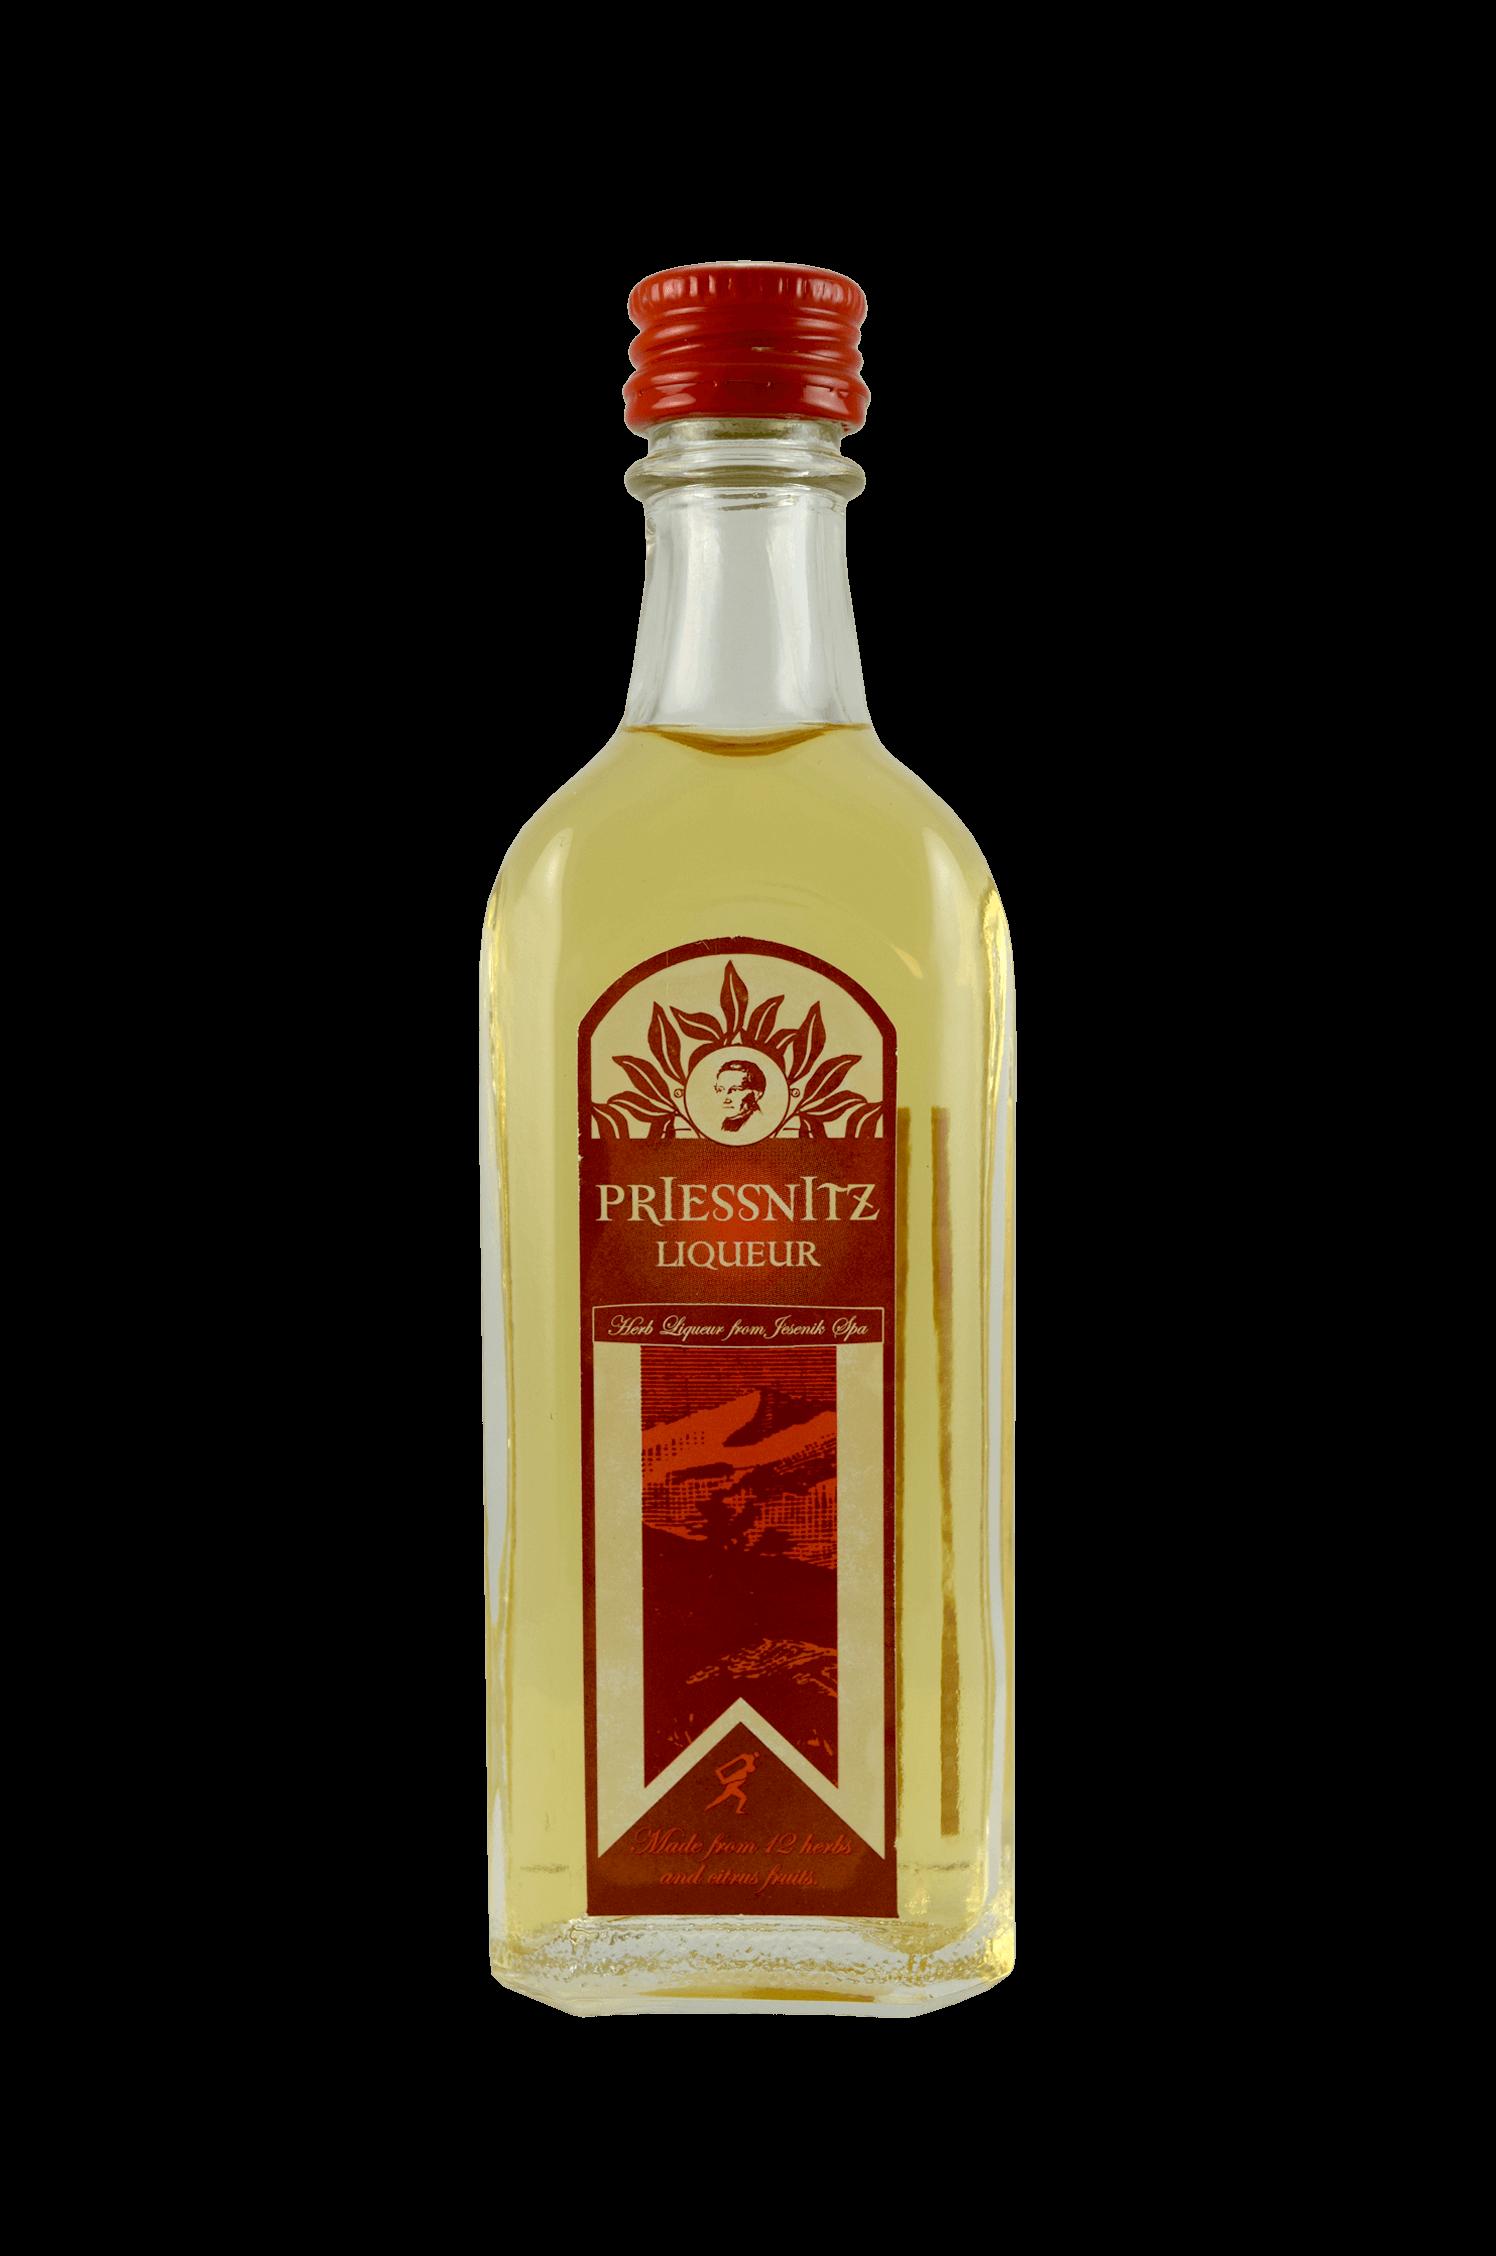 Priessnitz Liqueur